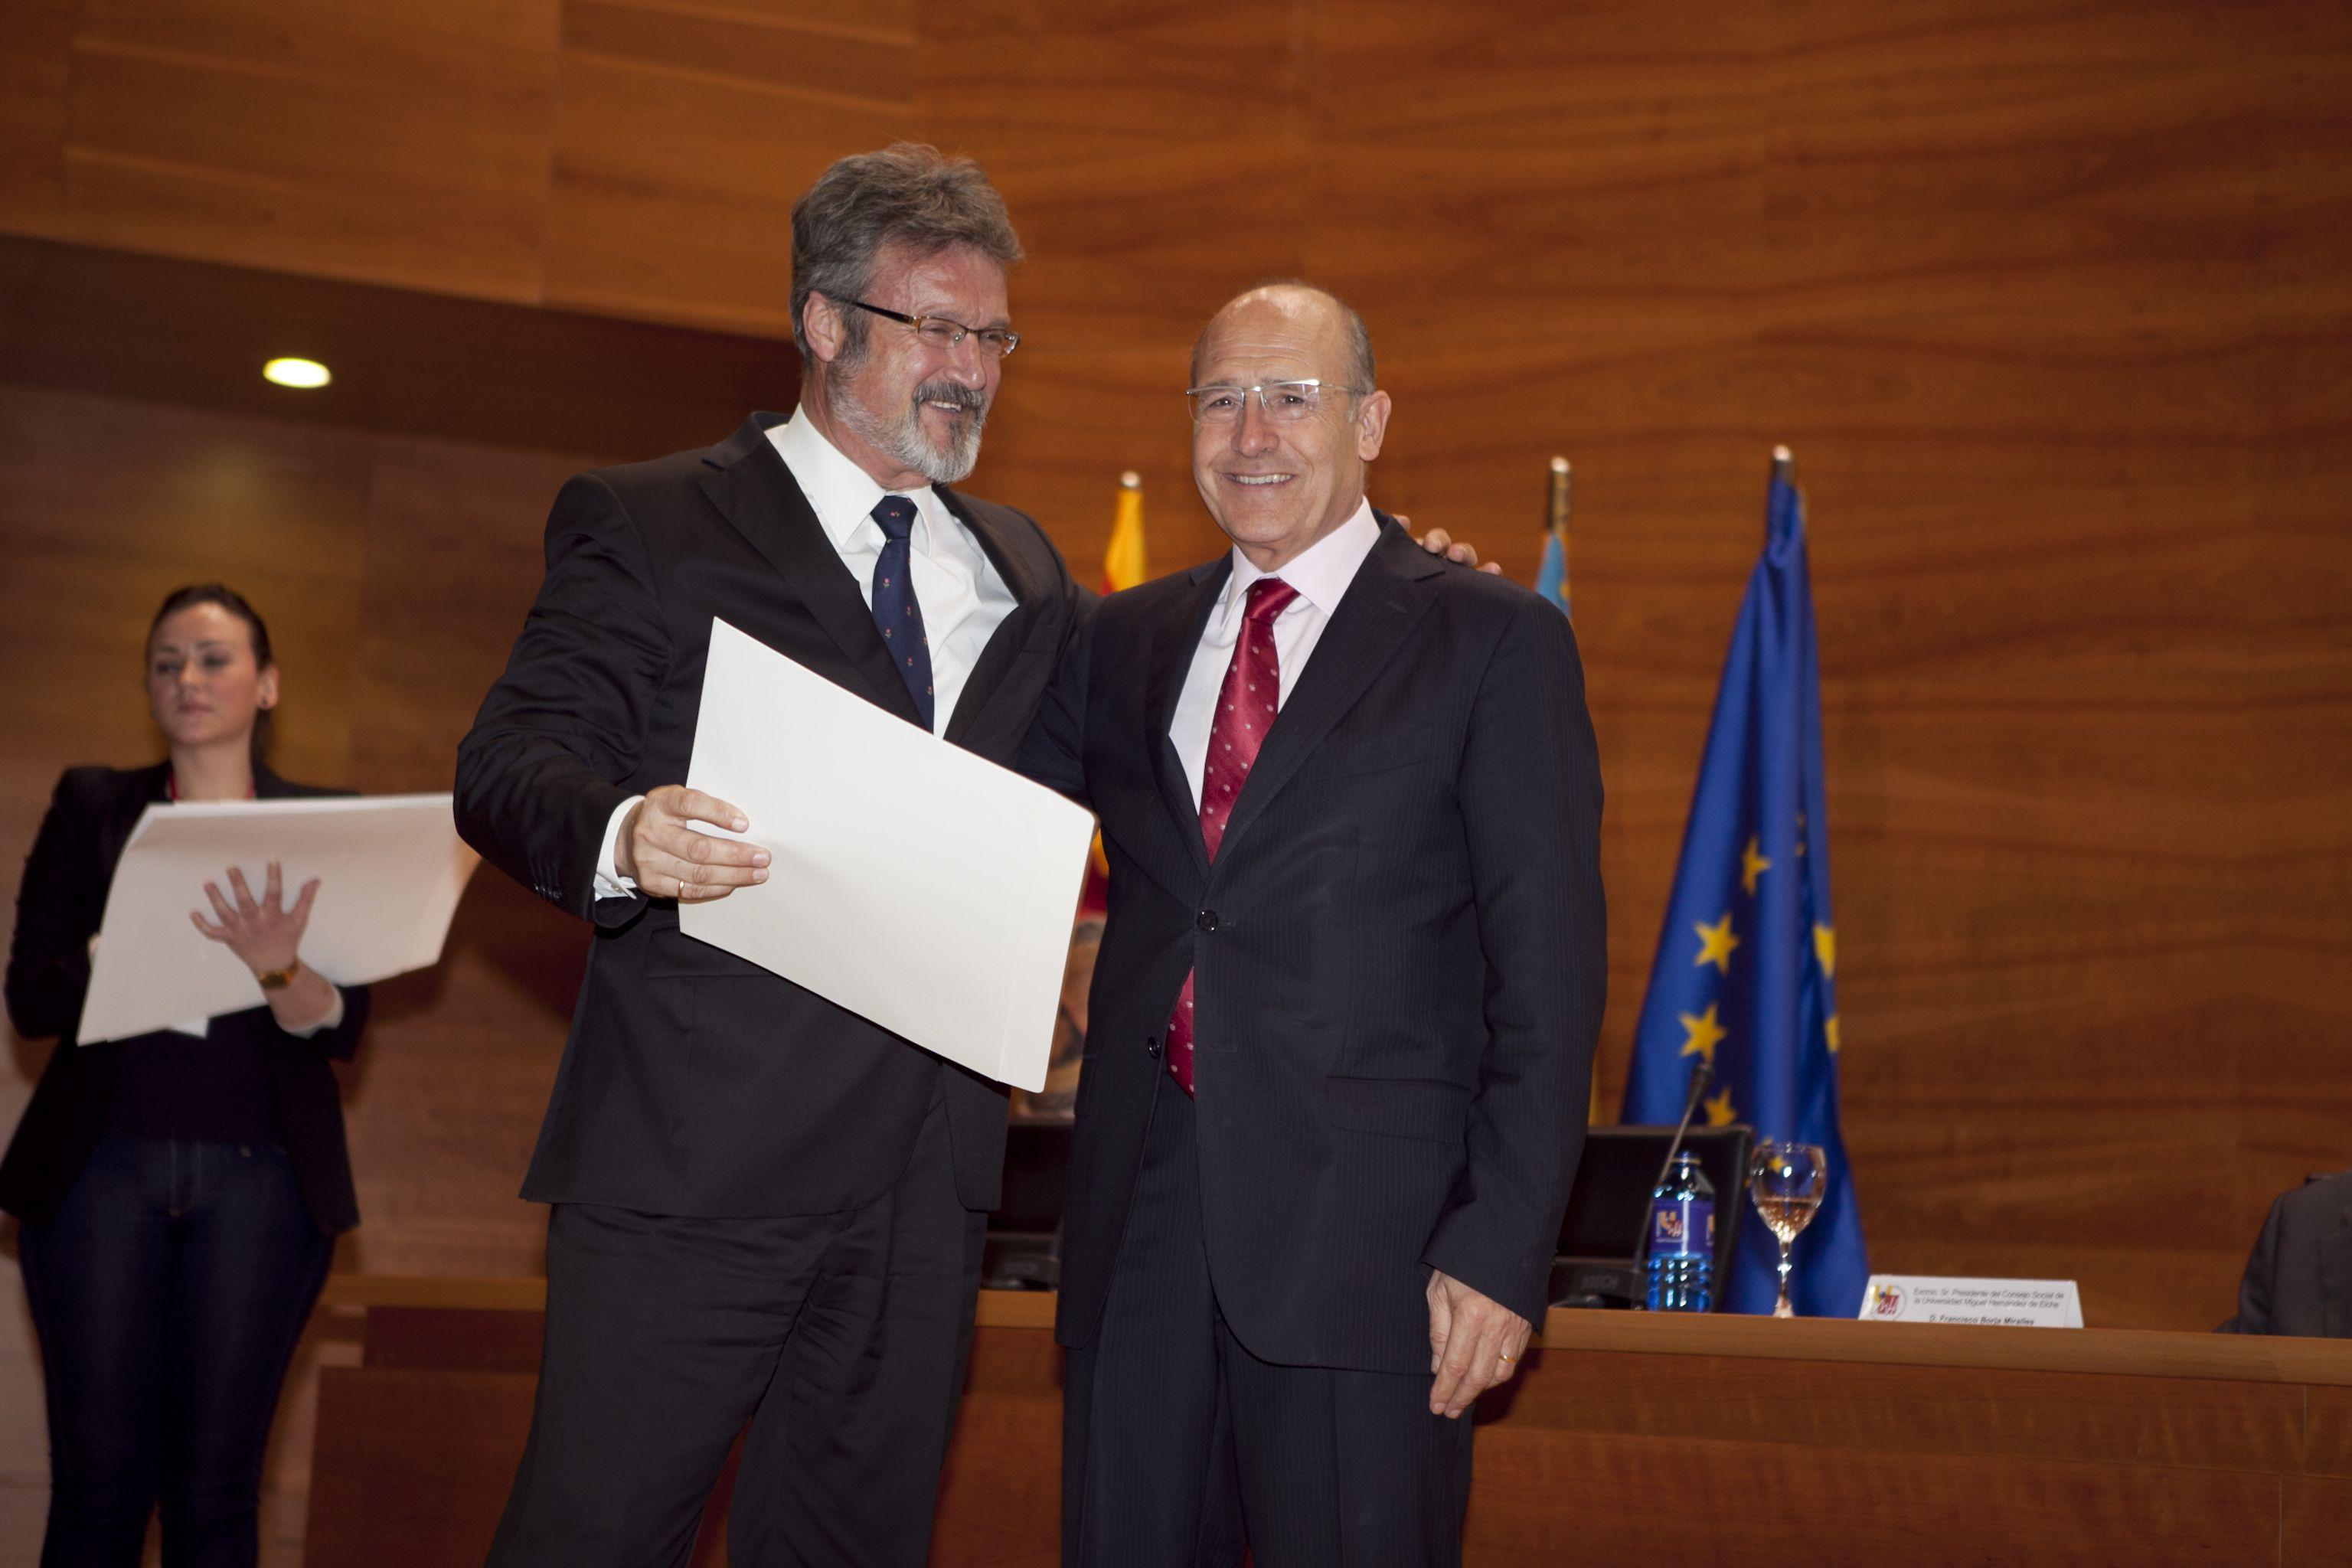 umh-diplomas-rector_mg_6632.jpg